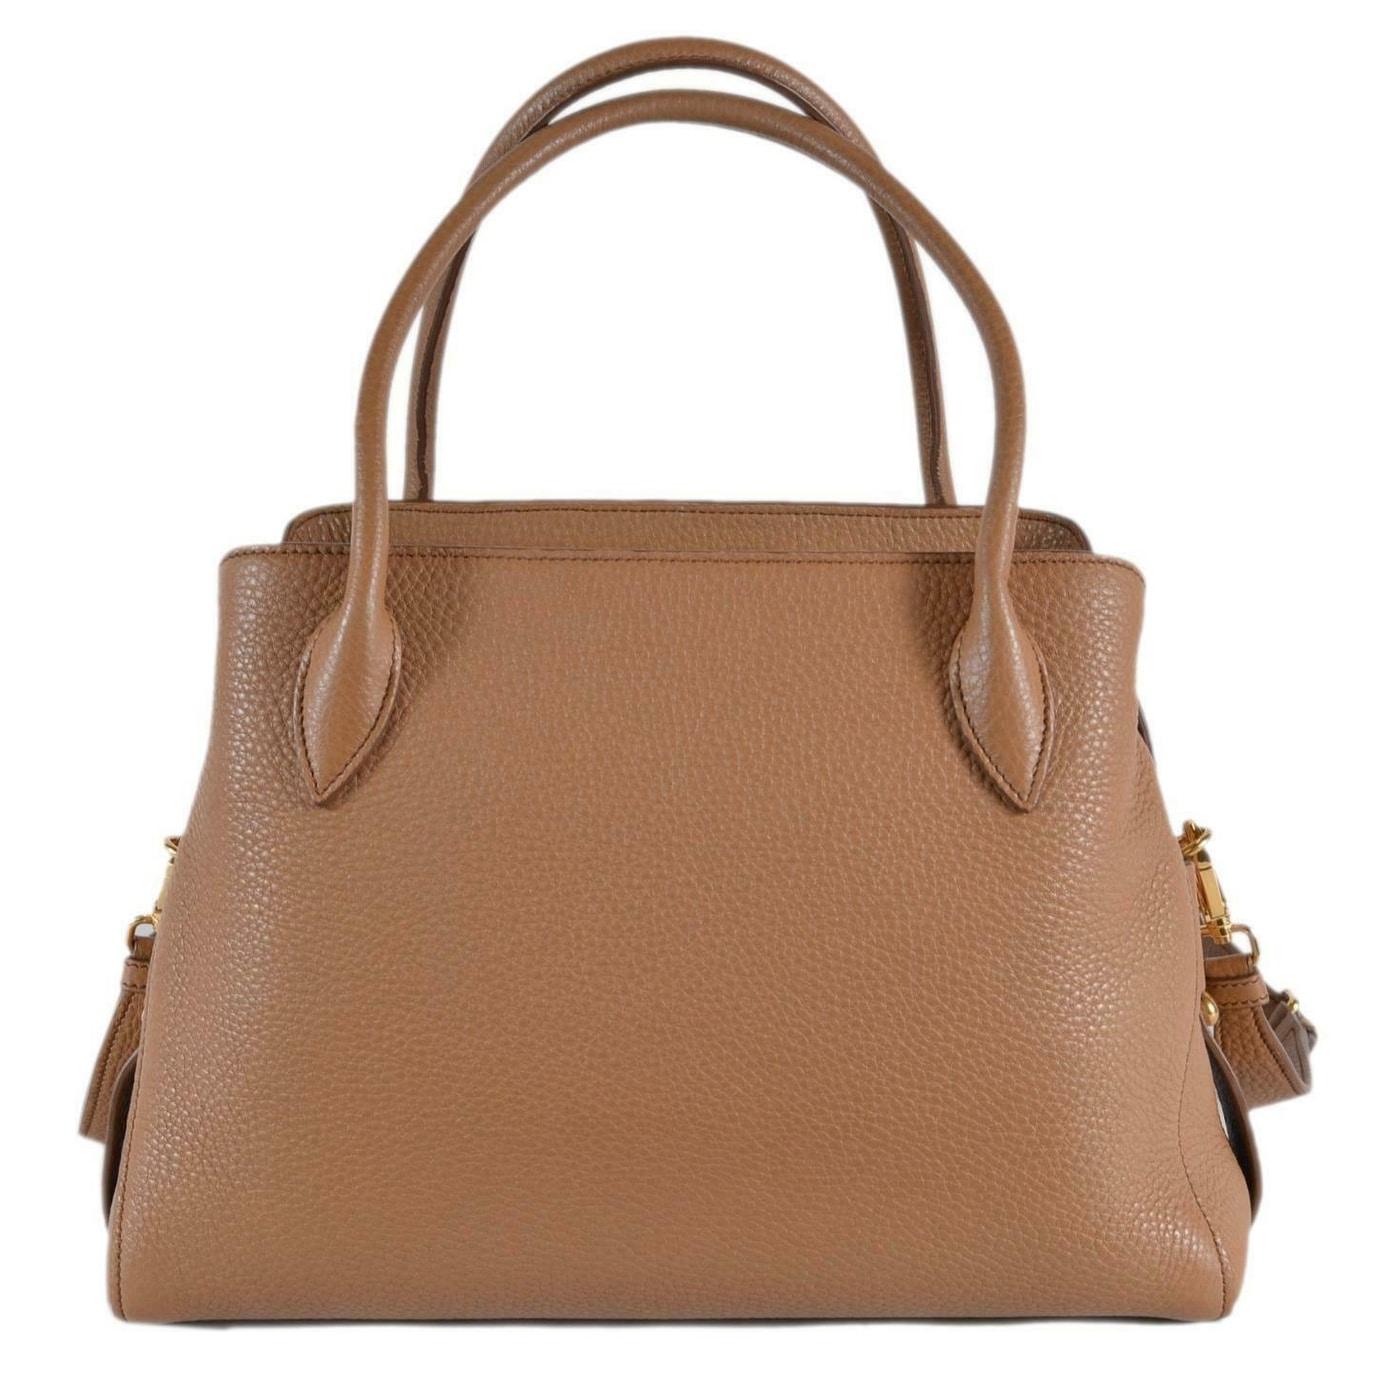 1aaa01d341dd18 Shop Prada 1BA127 Vitello Daino Leather Center Zip 2-Way Handbag Purse Bag  - Beige/Brown - Free Shipping Today - Overstock - 27425095